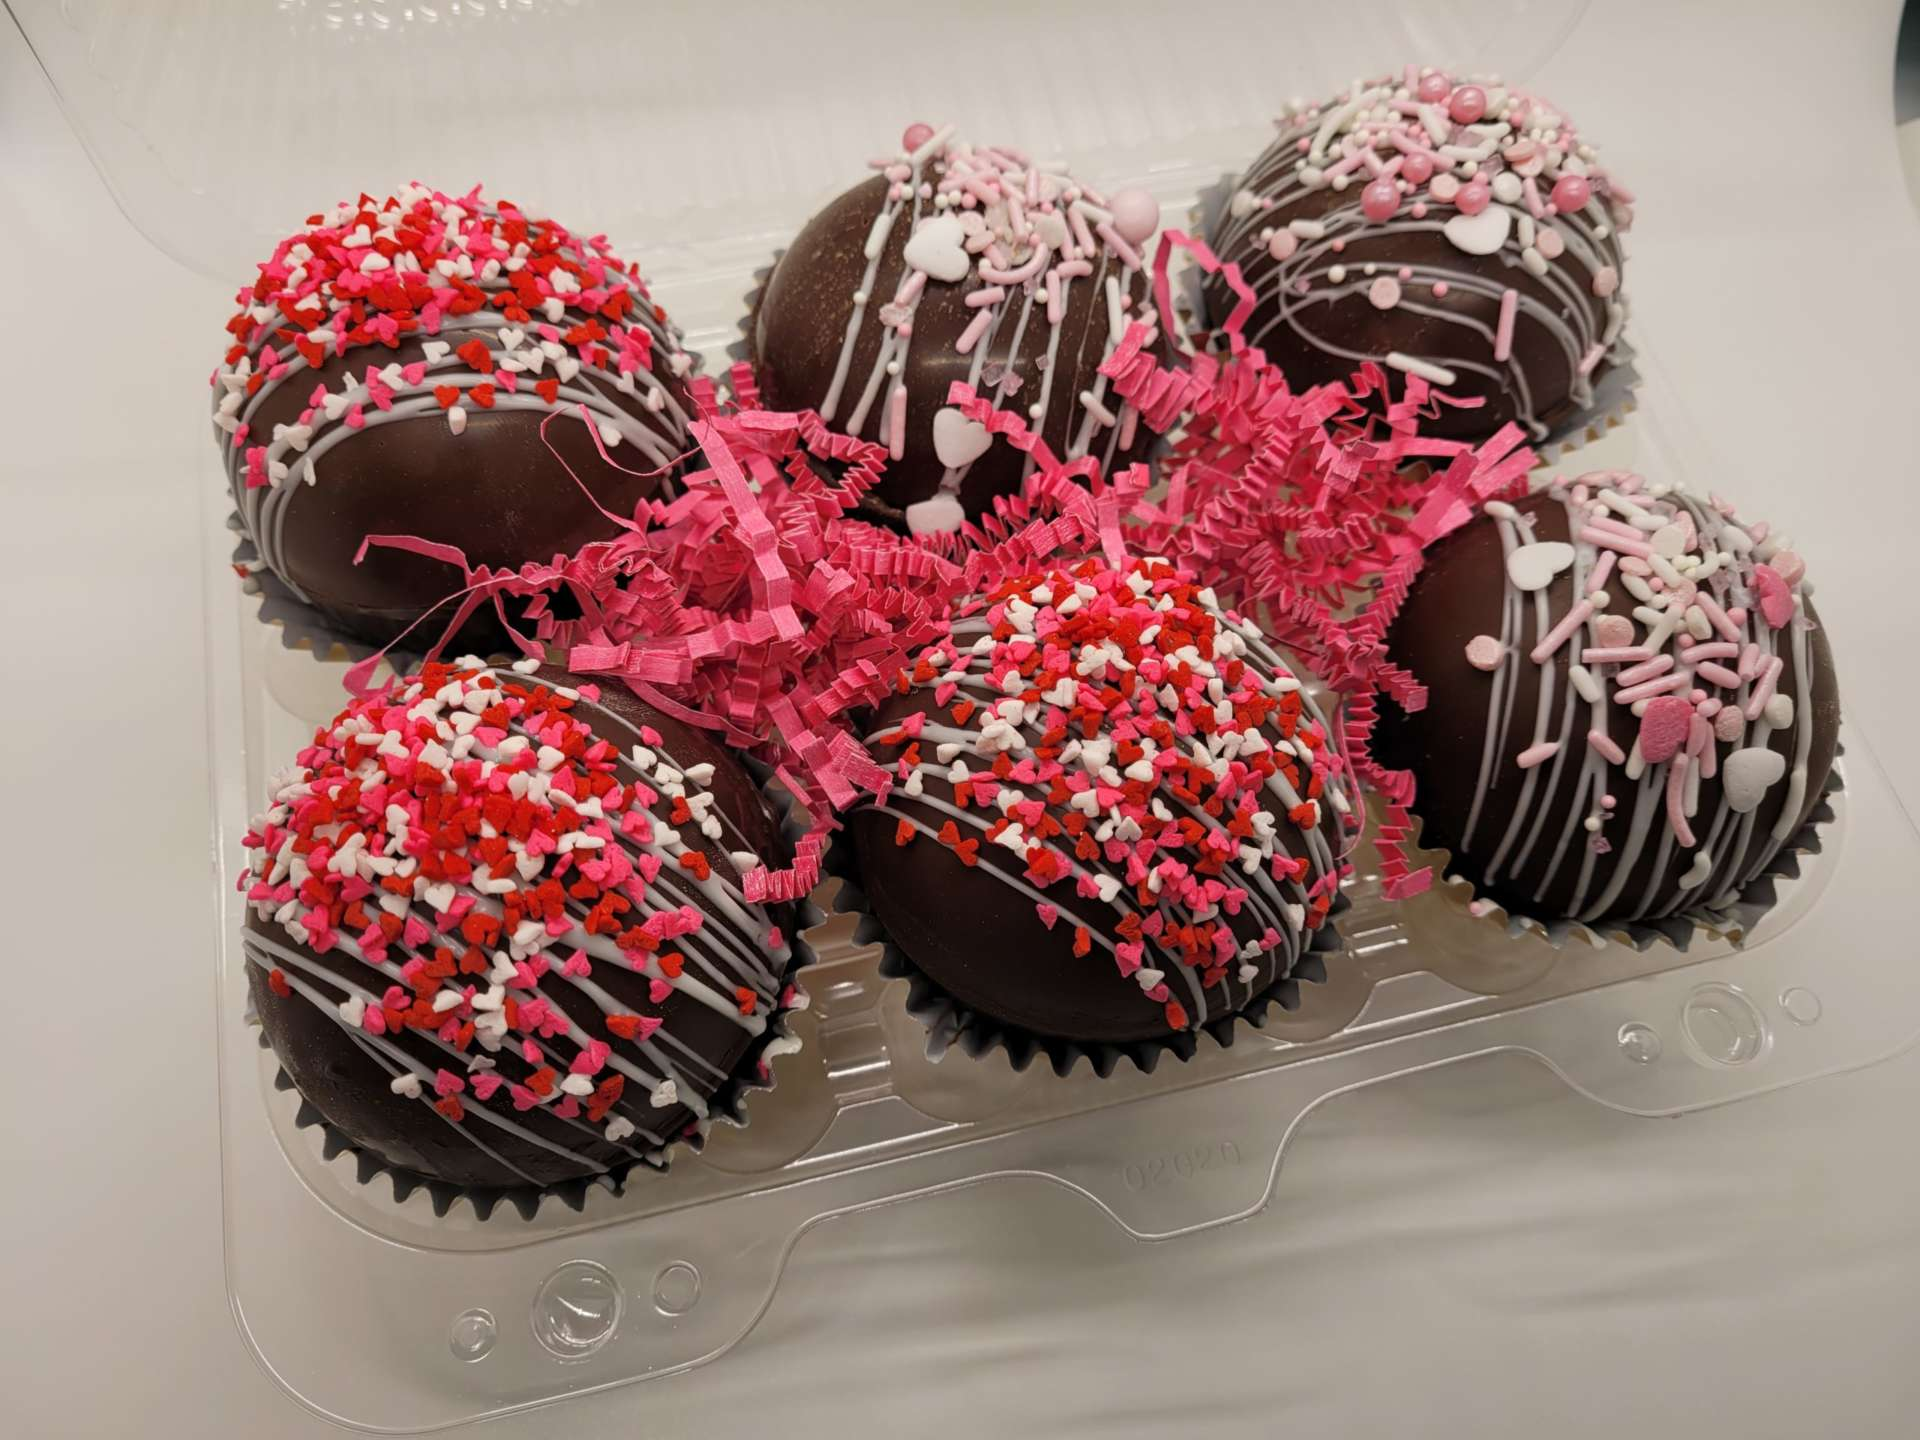 Juke N Jive Chocolate Hot Chocolate Bomb